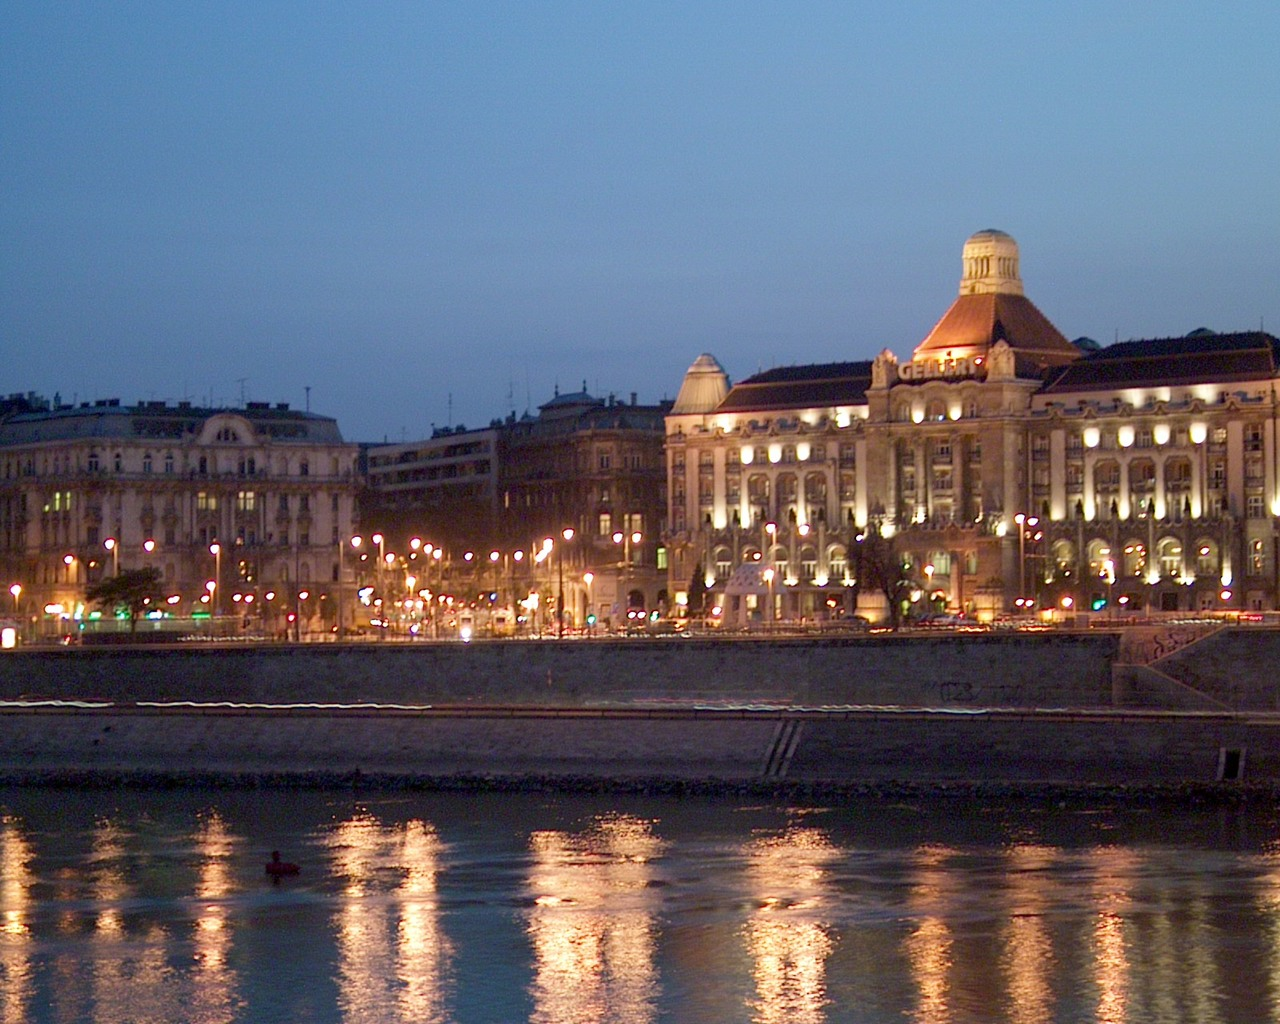 Quanto costa crociera Danubio Vienna-Praga